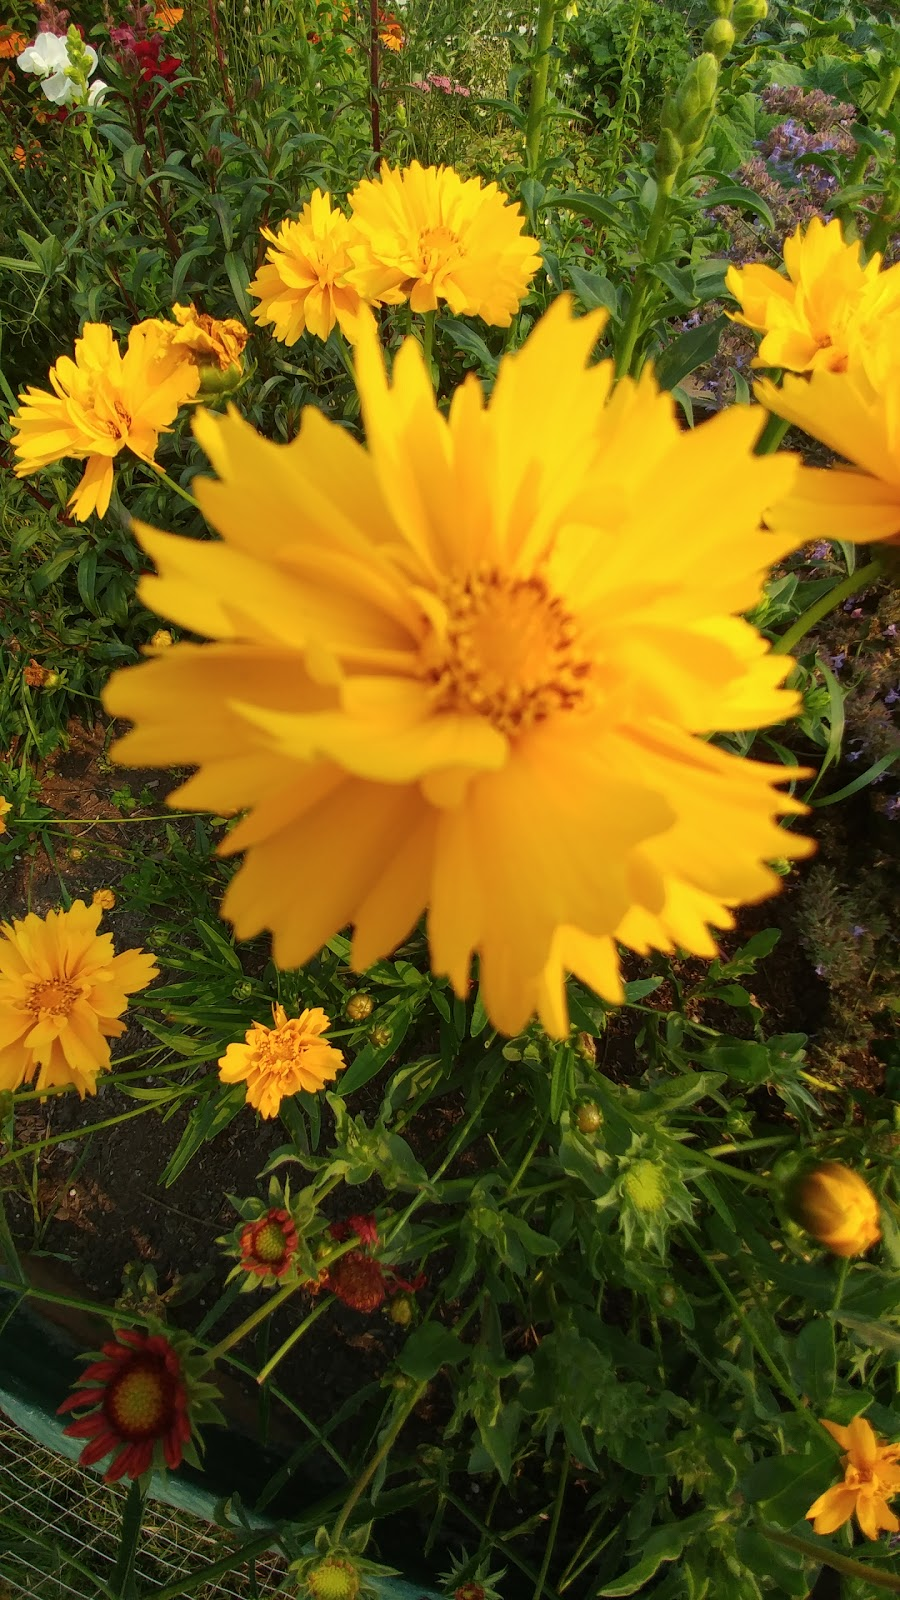 Dunsmuir Community Garden | park | 3C7, 12345 Sullivan St, Surrey, BC V4A 3B7, Canada